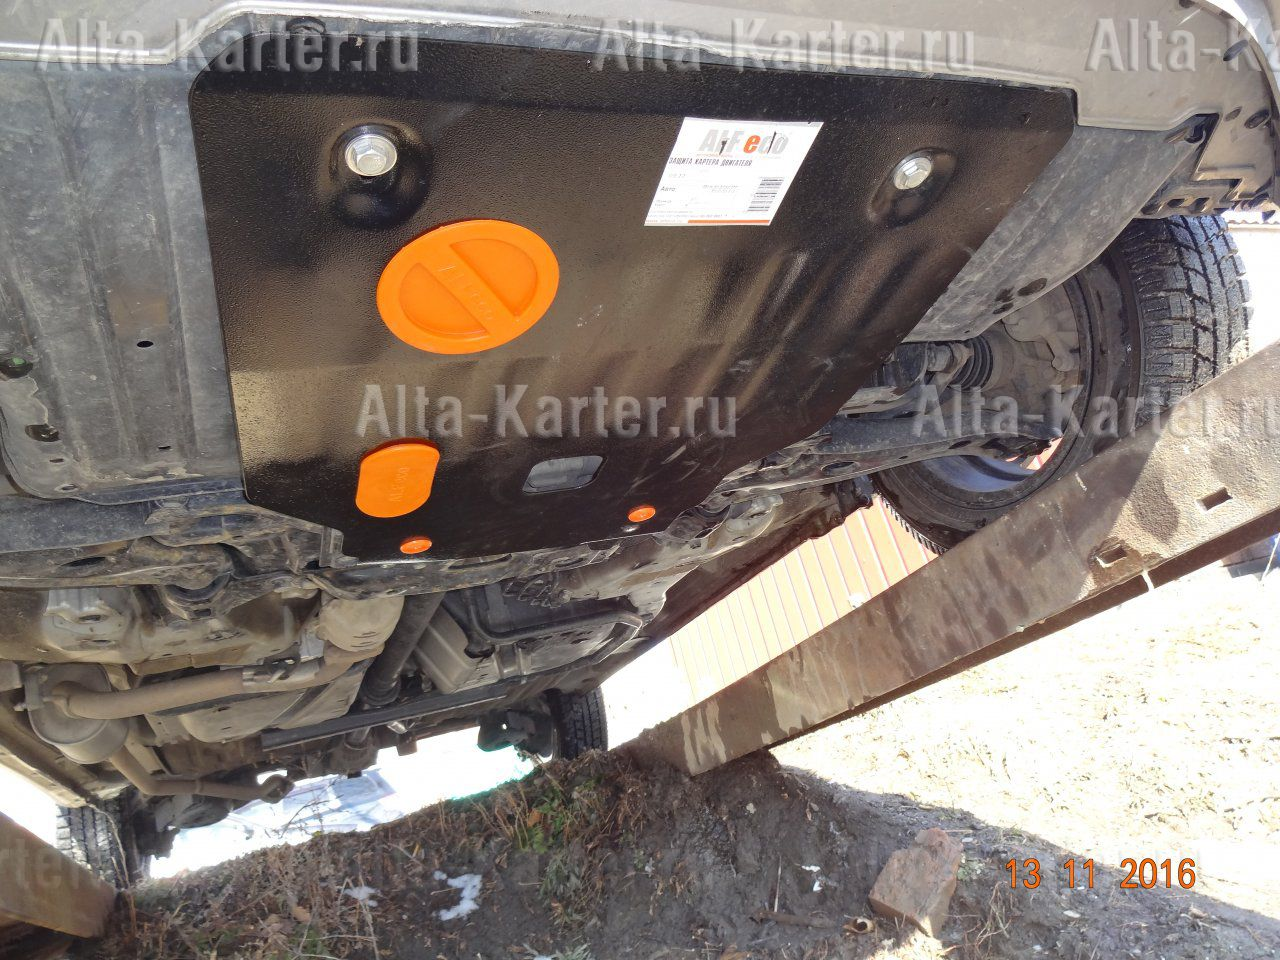 Защита Alfeco для картера и КПП Honda Jazz II 2008-2014. Артикул ALF.09.14